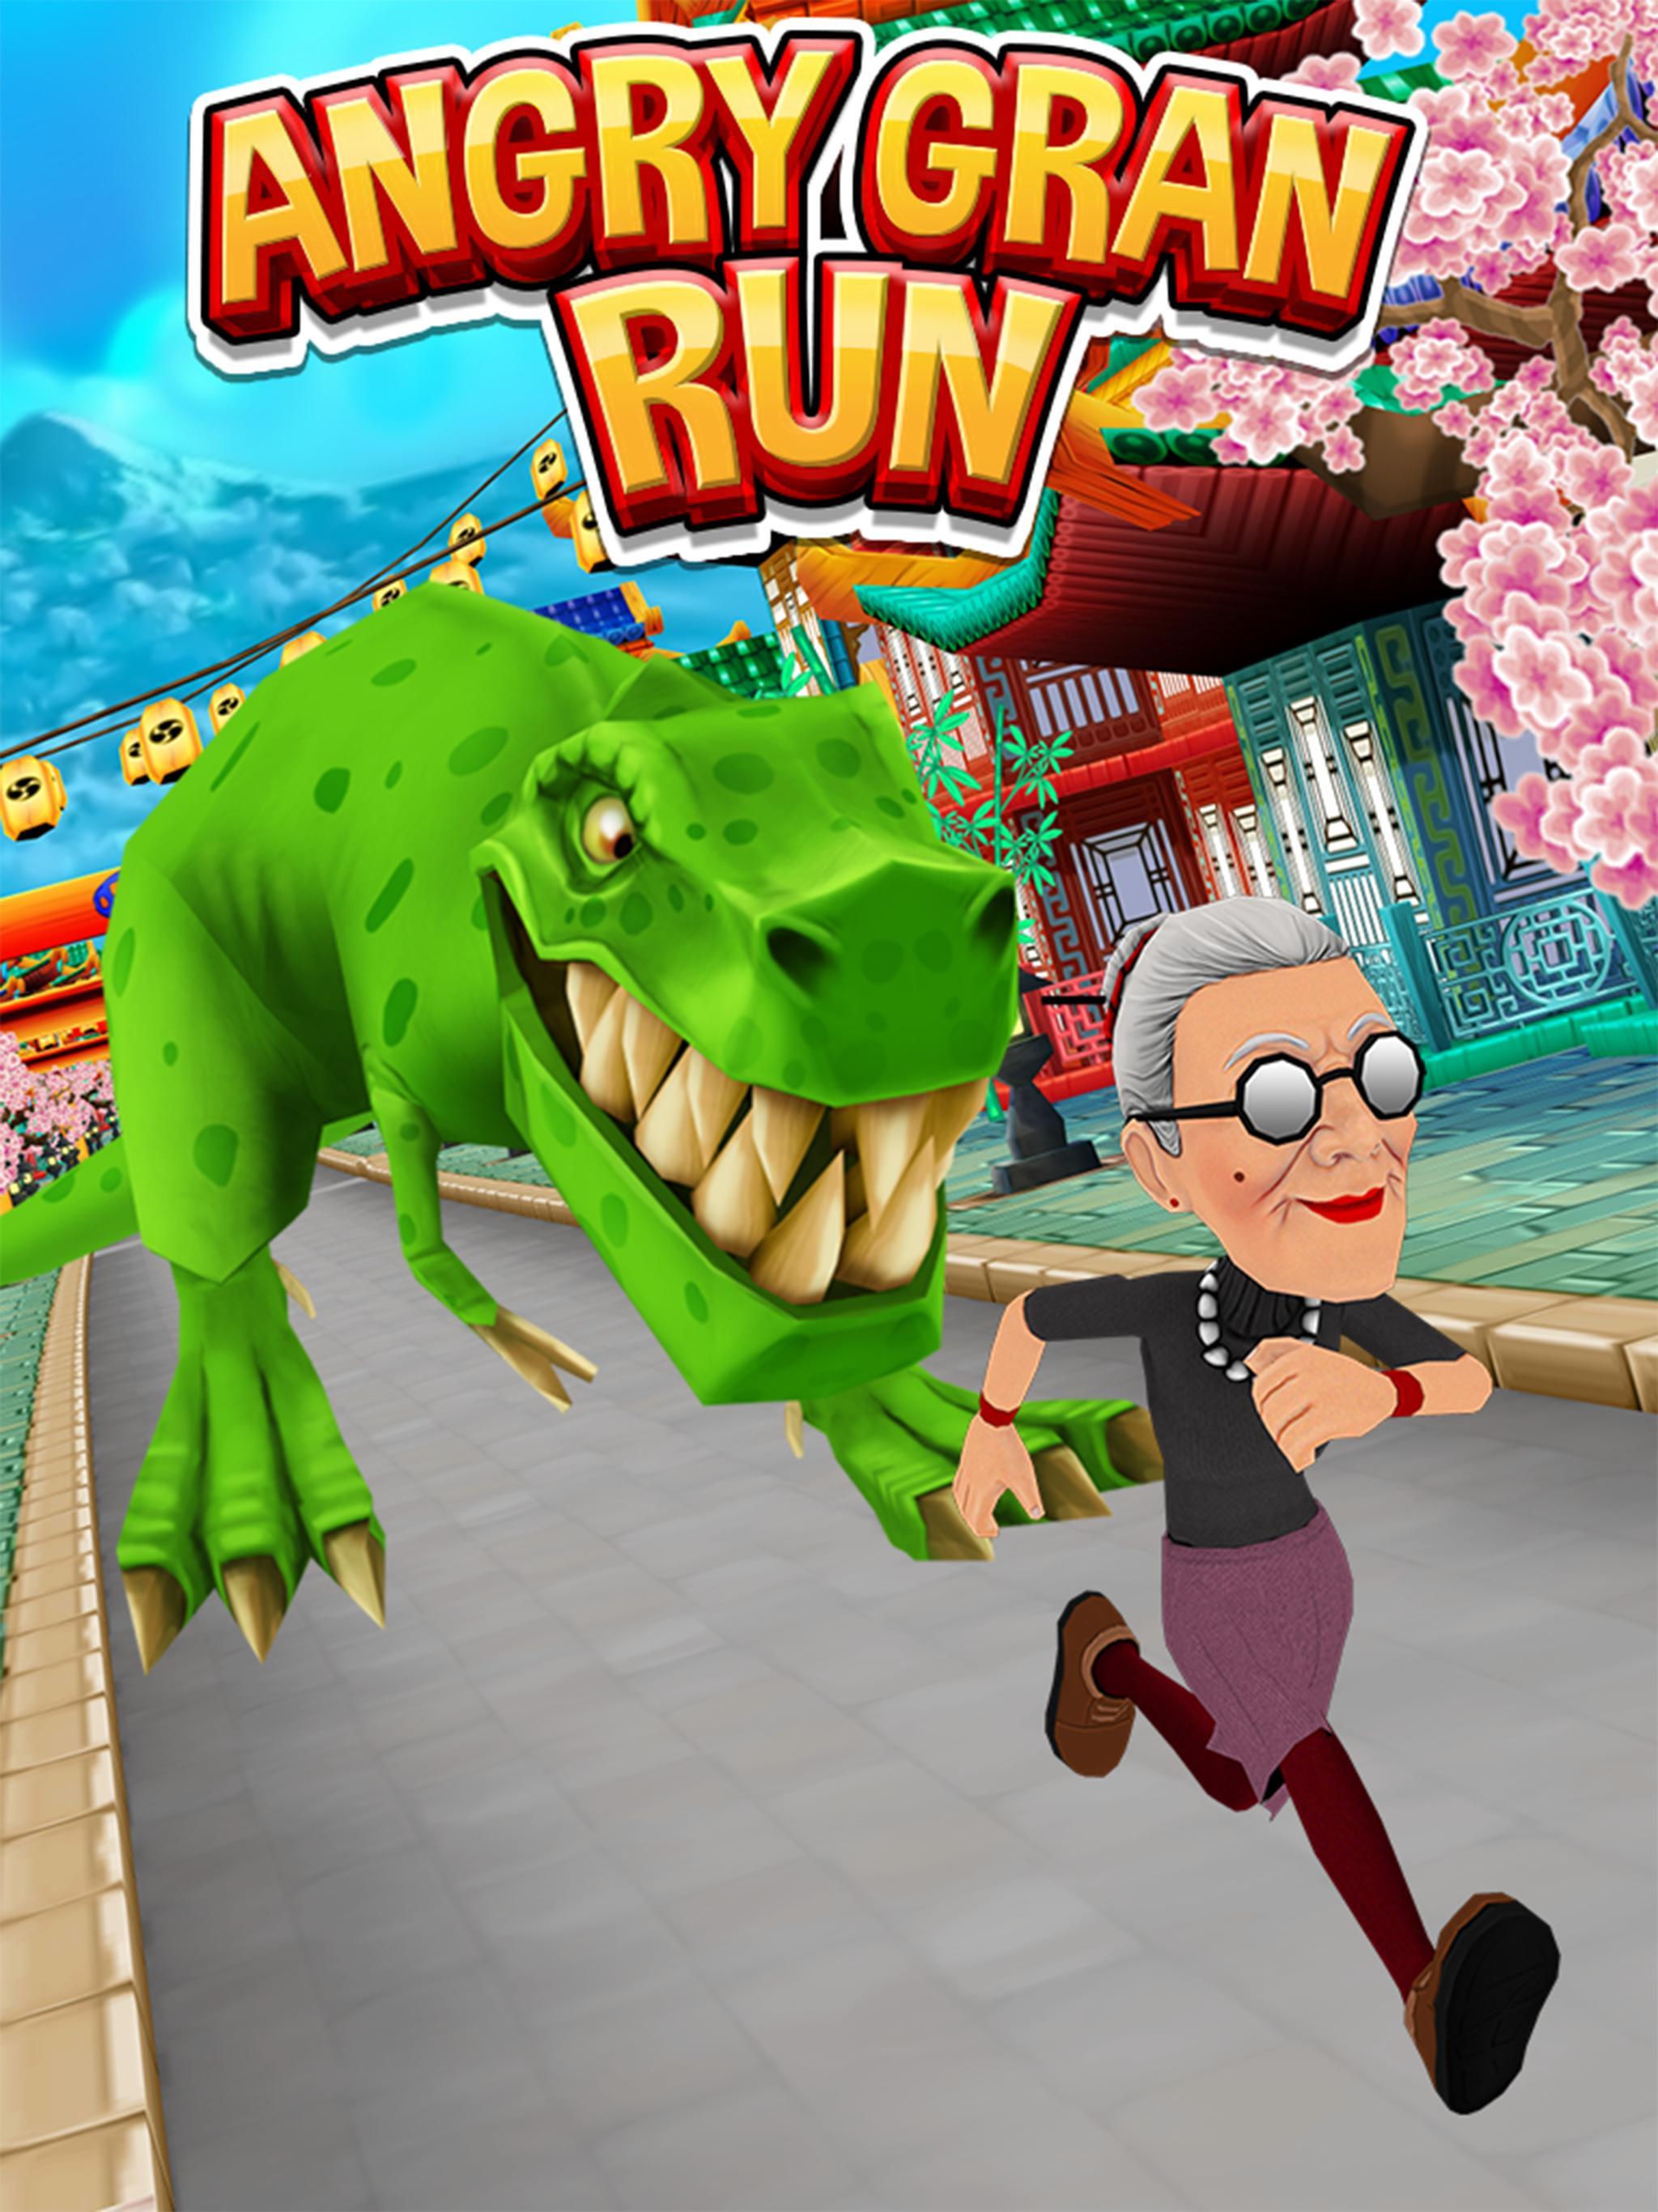 Angry Gran Run Running Game 2.12.1 Screenshot 6